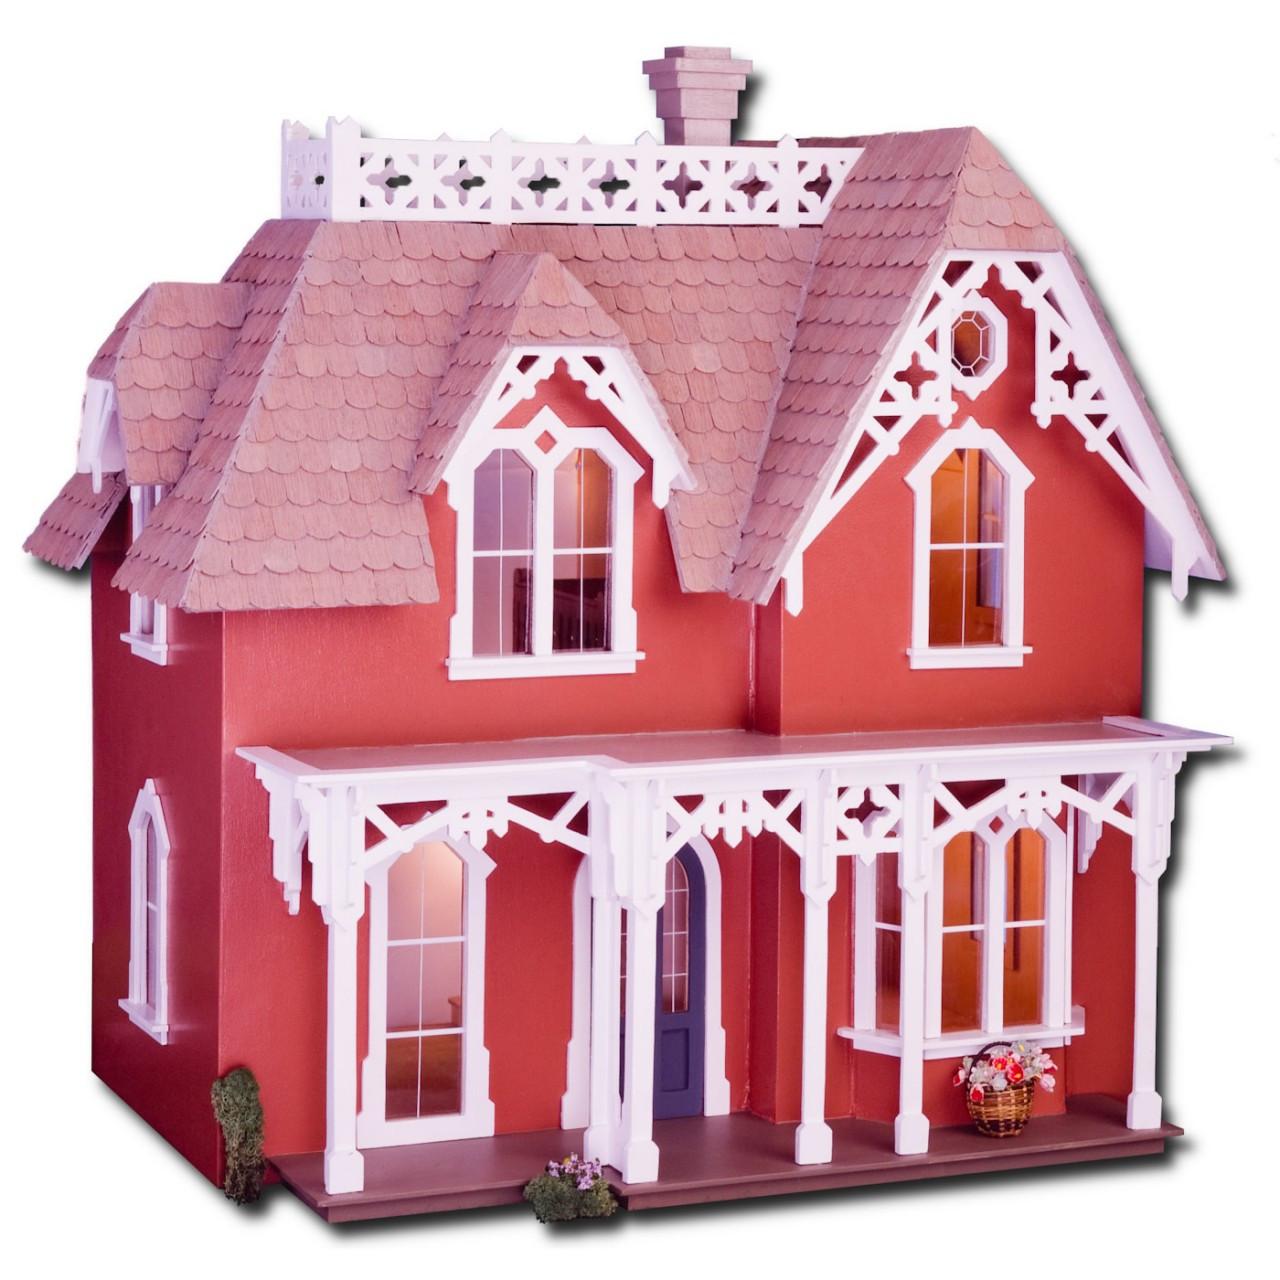 Laser Cut Chantilly Dollhouse Kit